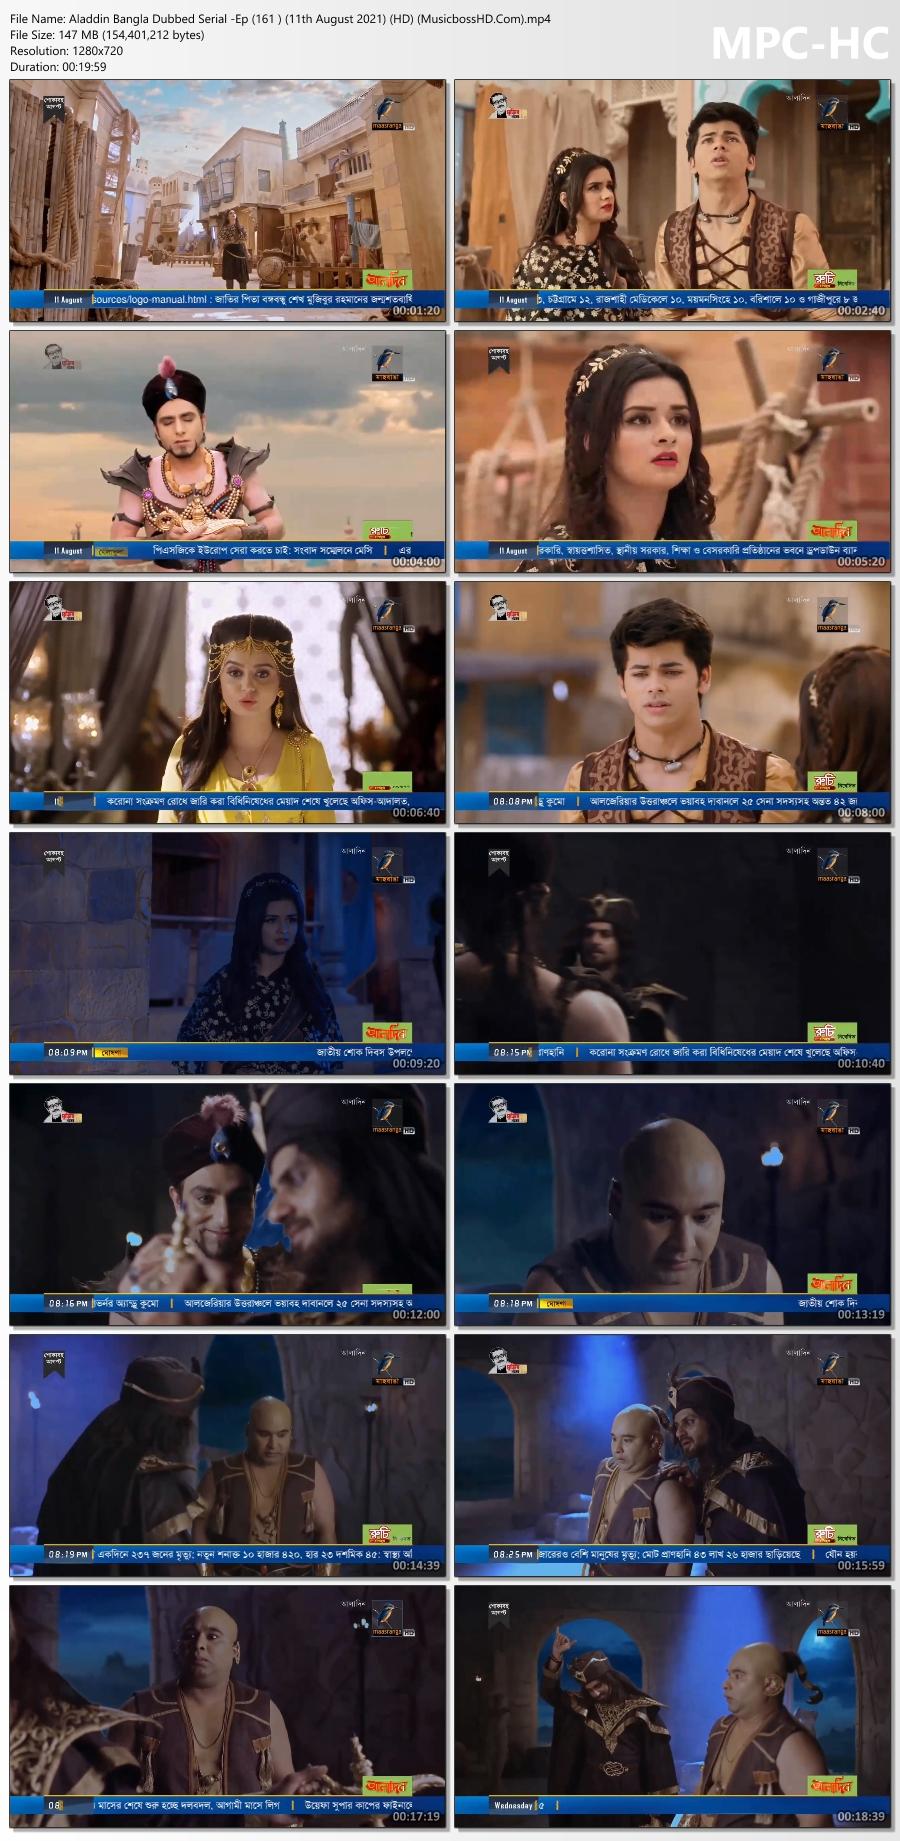 Aladdin-Bangla-Dubbed-Serial-Ep-161-11th-August-2021-HD-Musicboss-HD-Com-mp4-thumbs